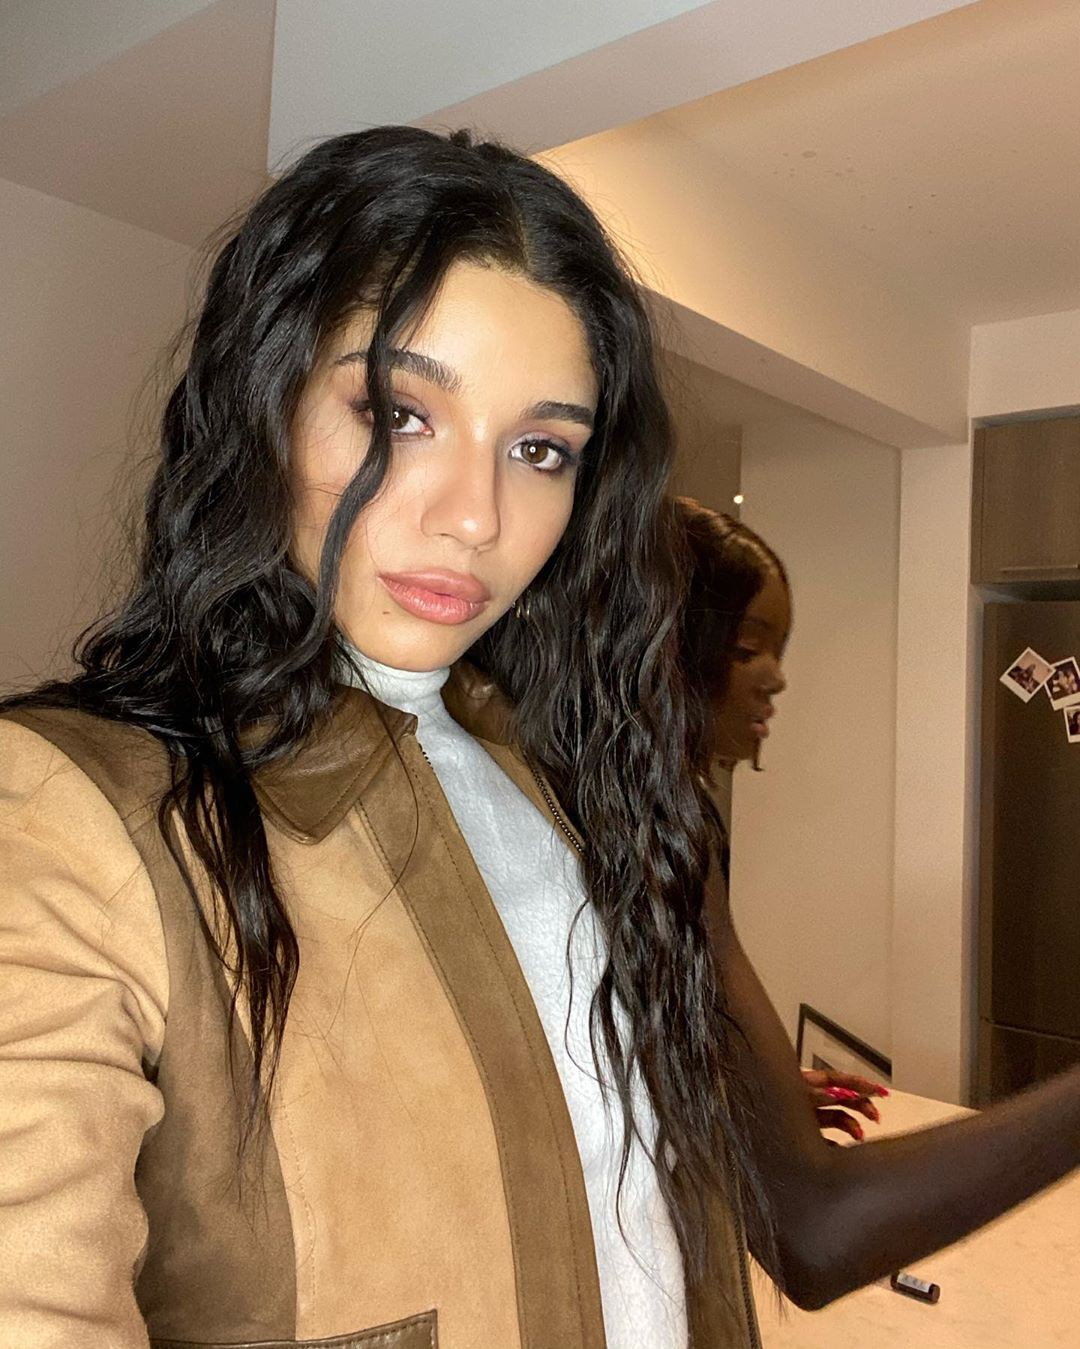 Yovanna Ventura Dark Black Hairs, Beautiful Lips, Hairstyles For Long Hair